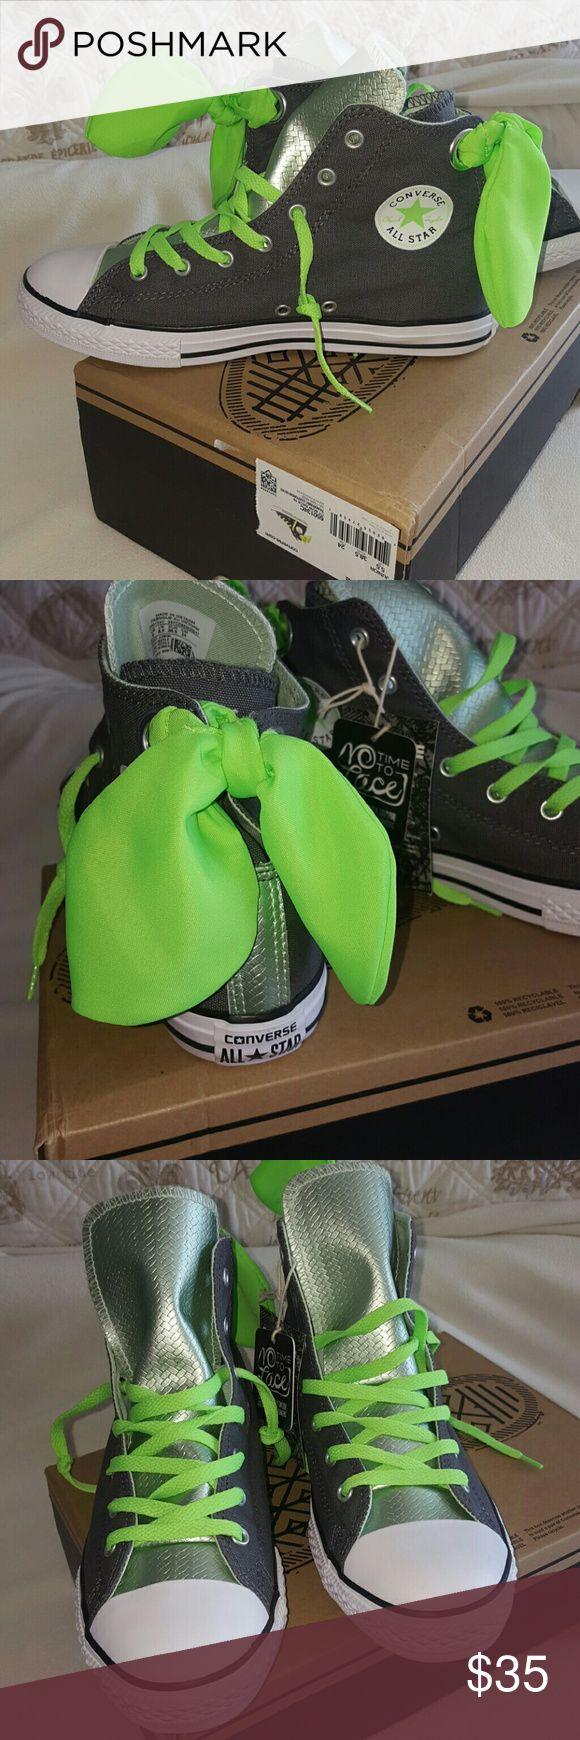 Converse NWT converse dark grey, silver and neon green. Super cute!!! Converse Shoes Sneakers